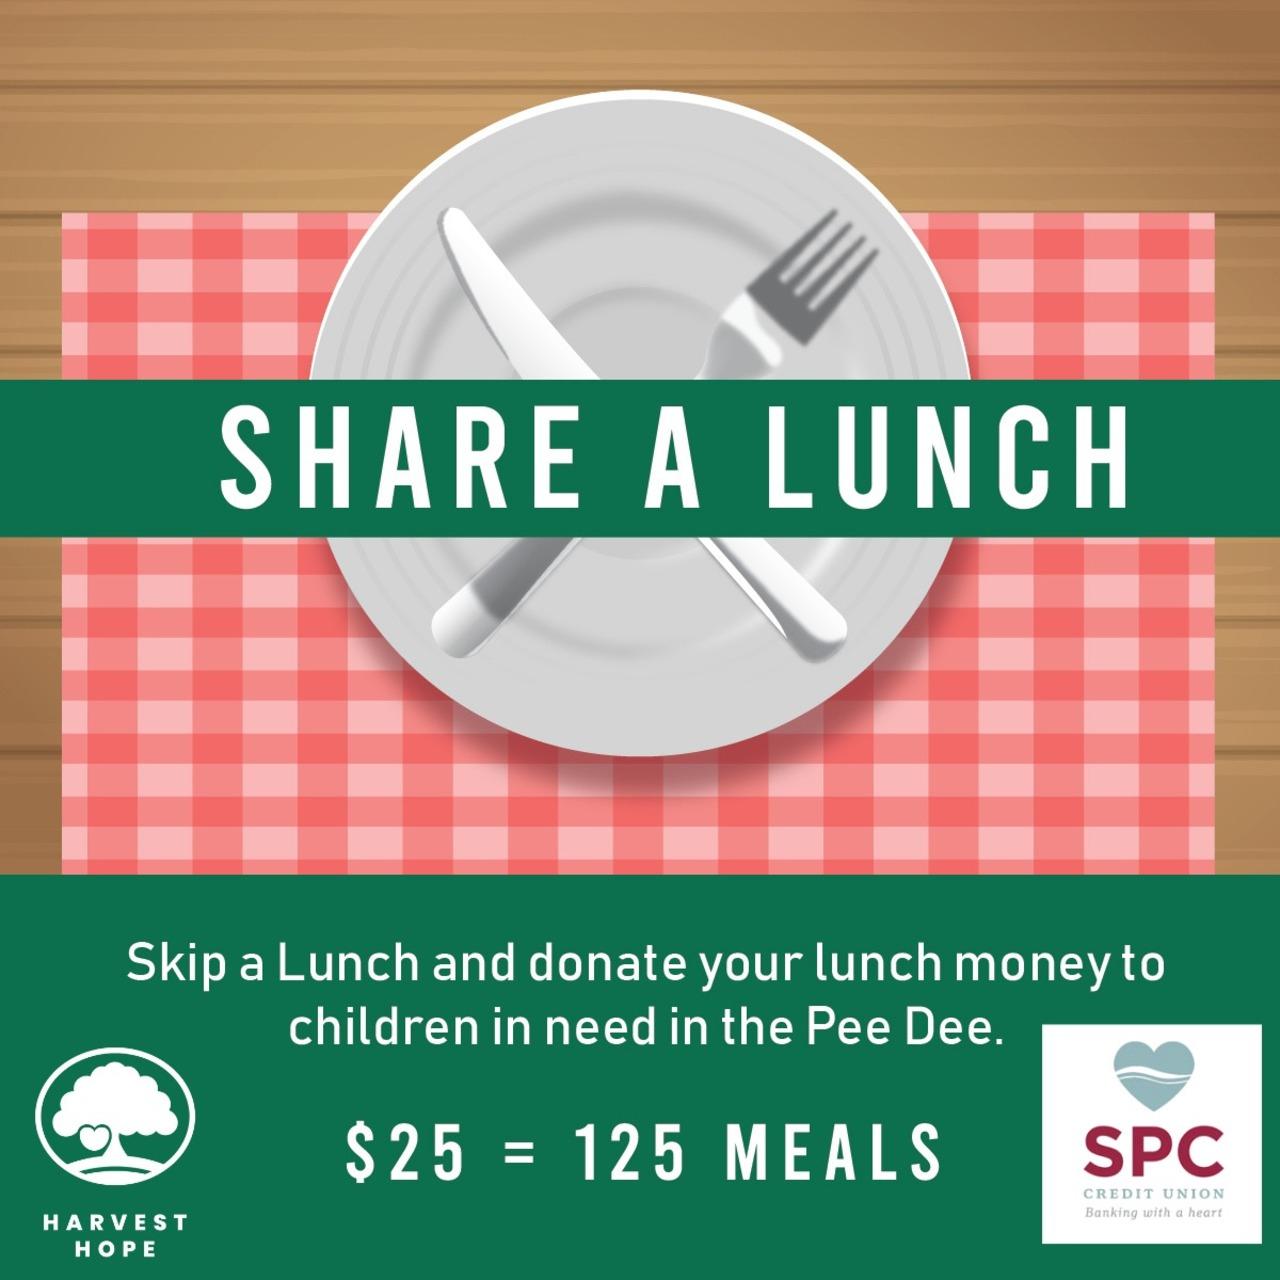 SPC Credit Union's Fundraiser for Harvest Hope